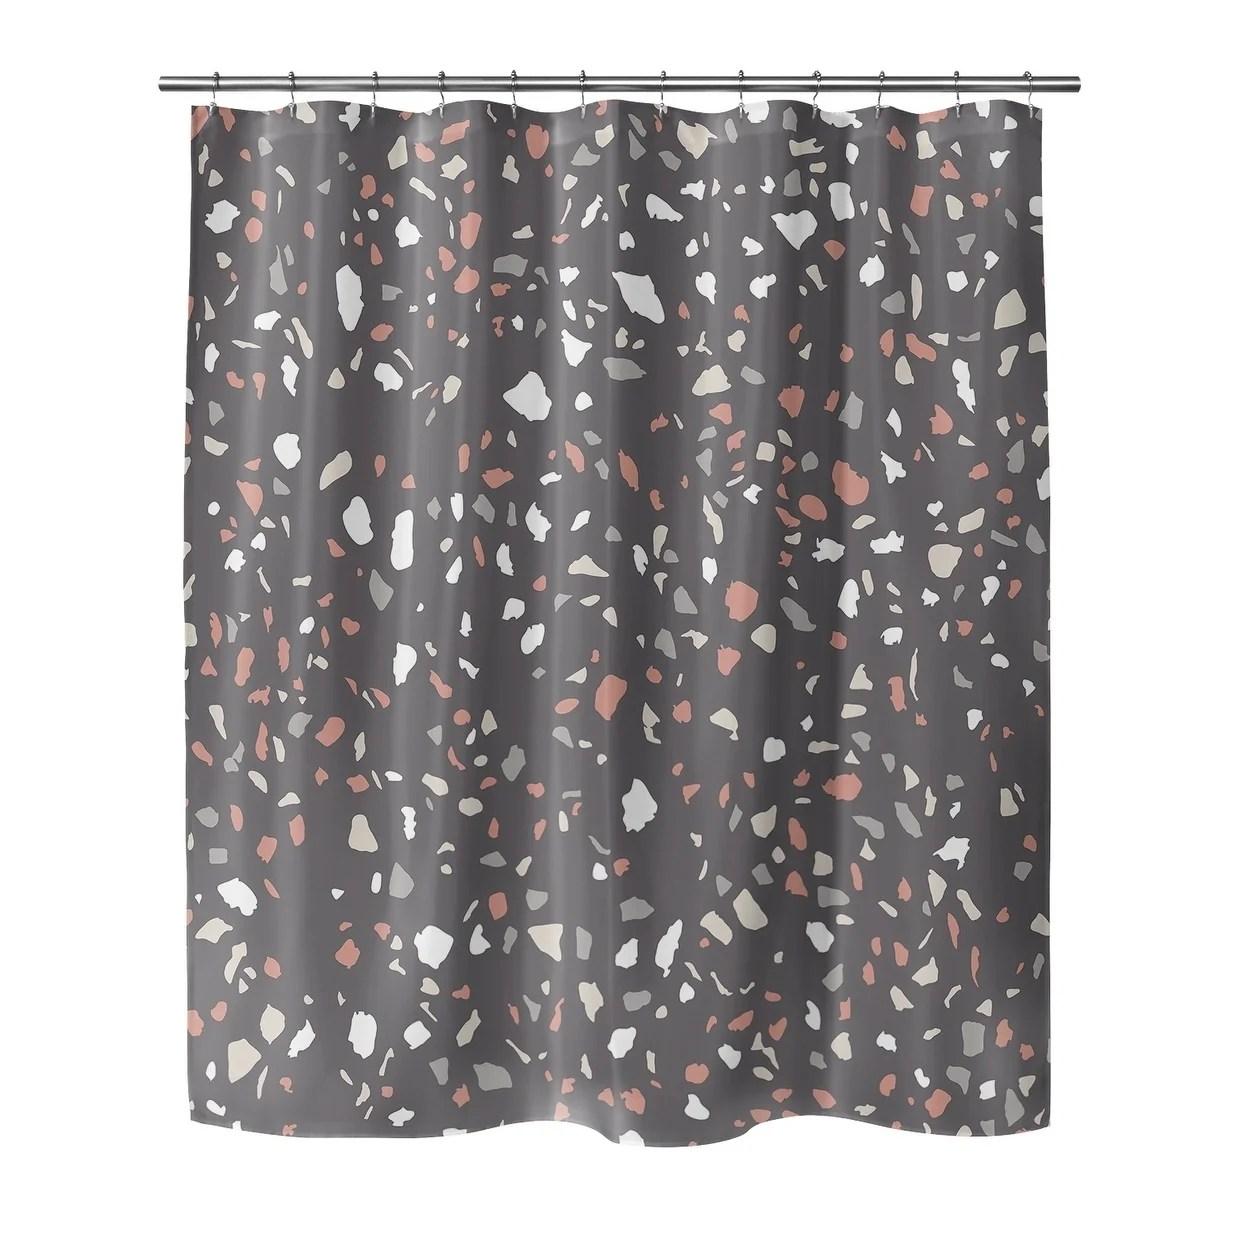 veneziana dark gray shower curtain by kavka designs